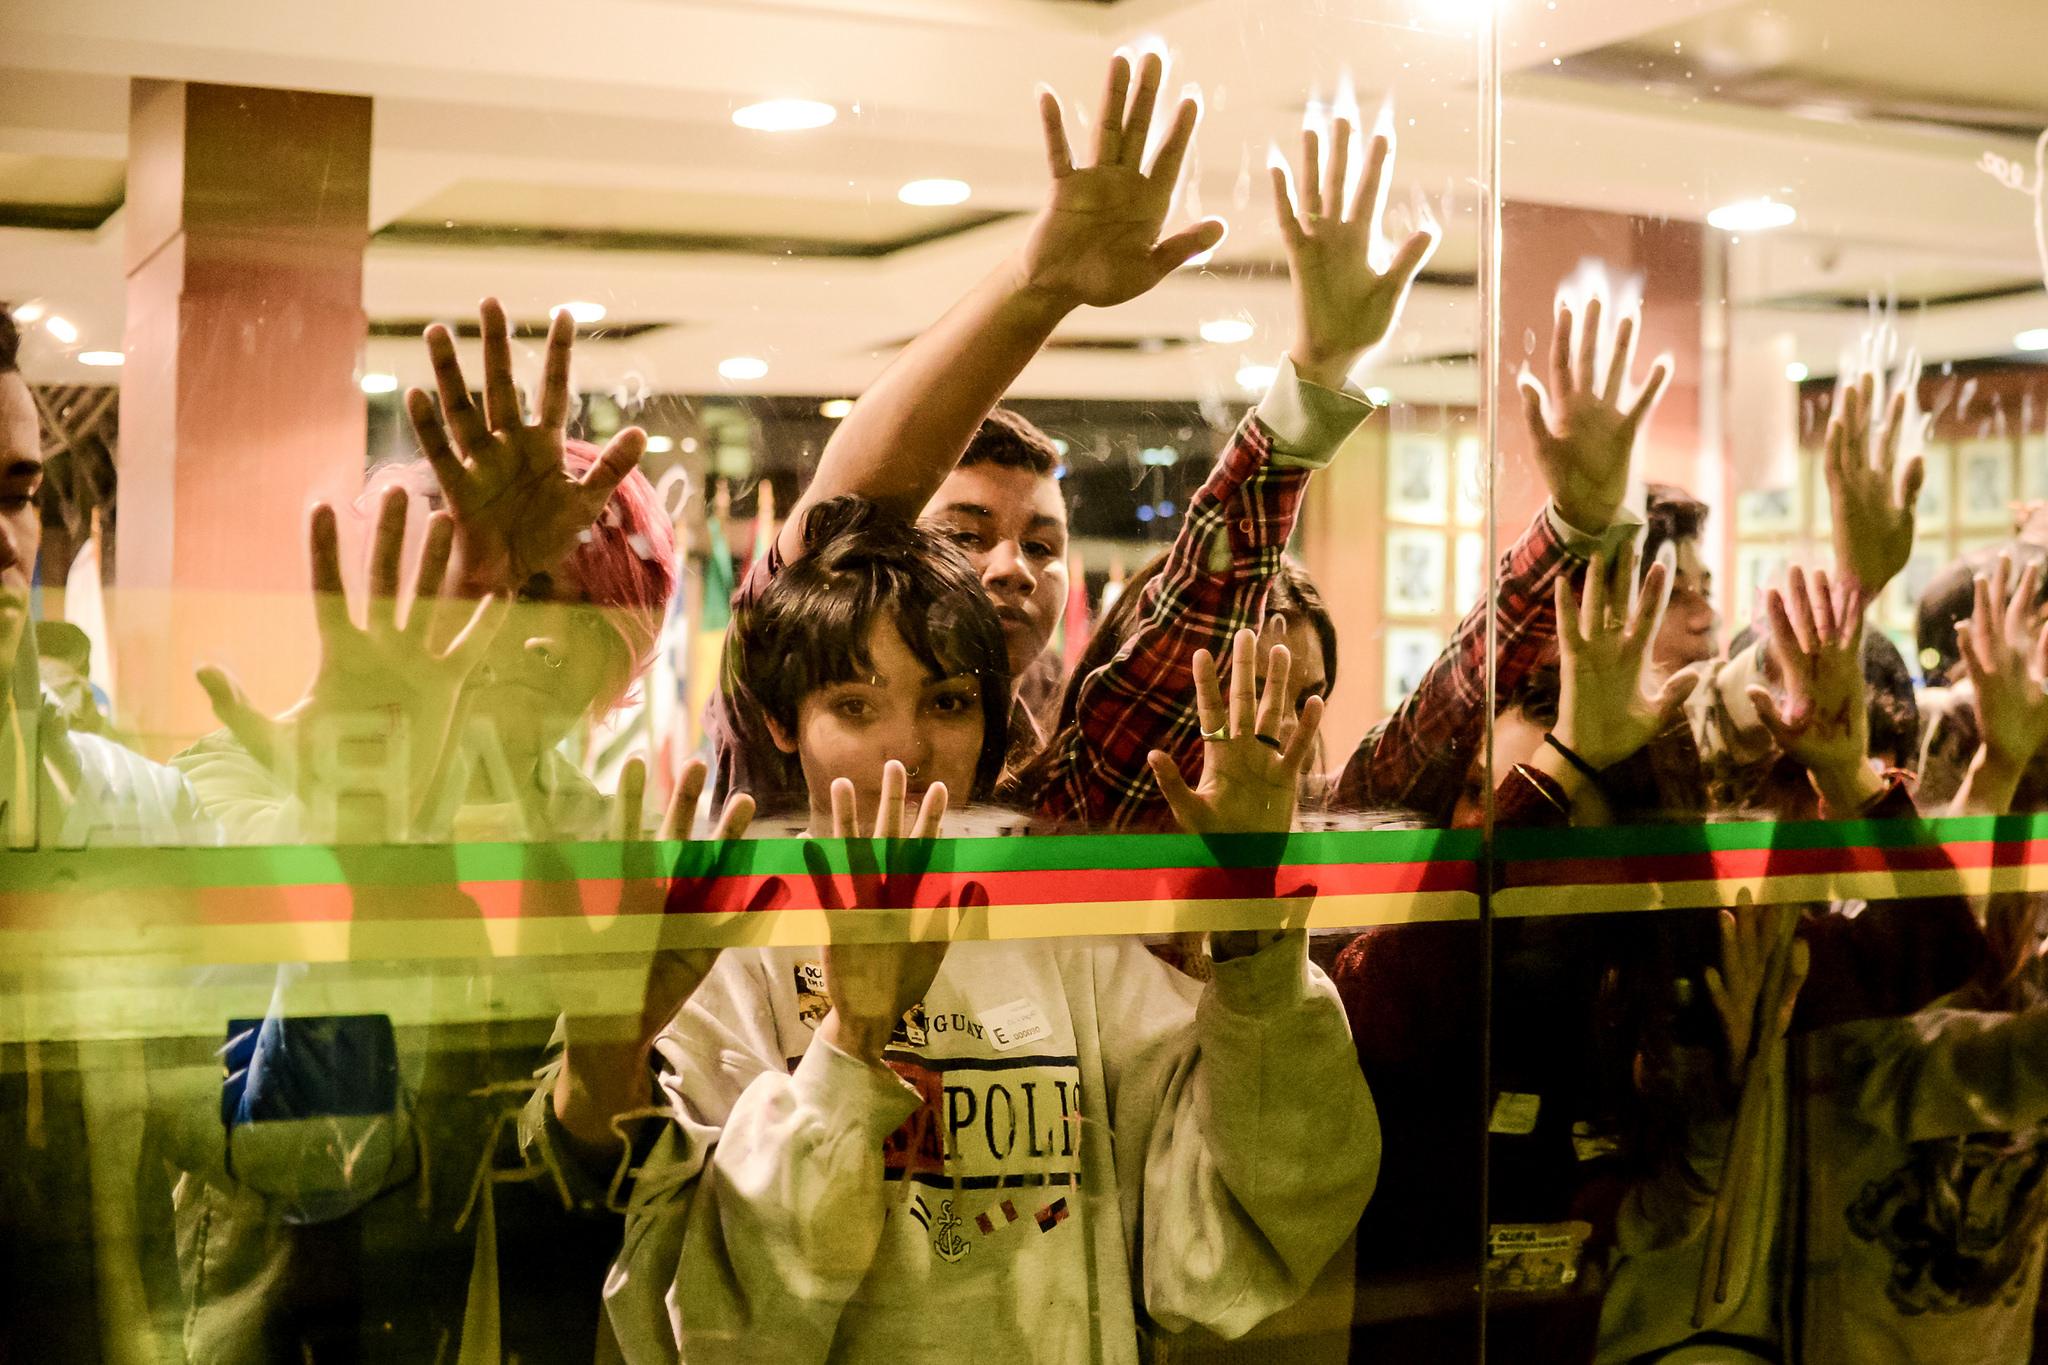 Secundaristas ocupam ALERGS em Porto Alegre (RS) • 13/06/2016. Foto: Mídia NINJA